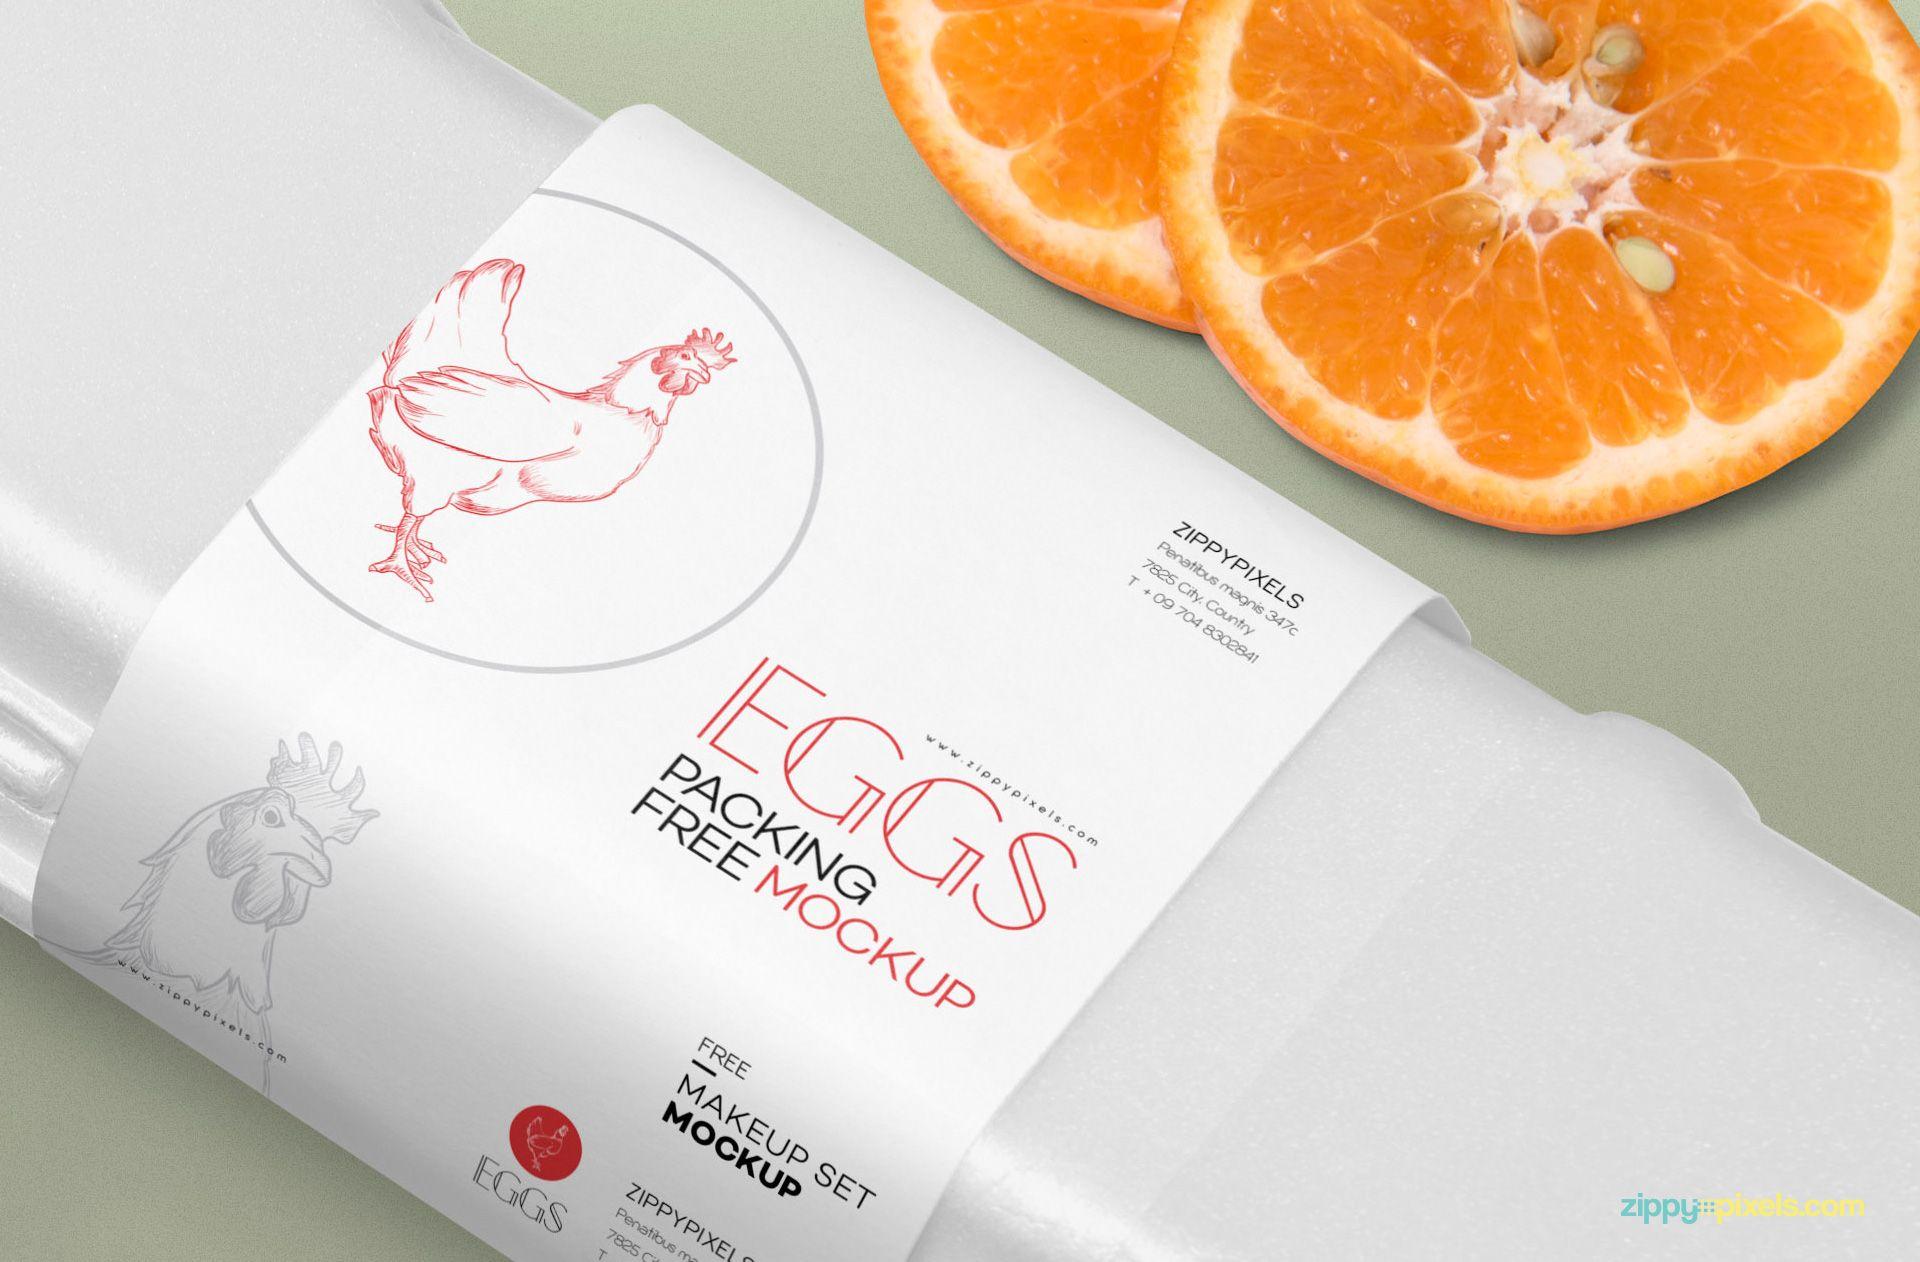 Download Free Egg Crate Mockup Zippypixels Egg Crates Crates Egg Packaging